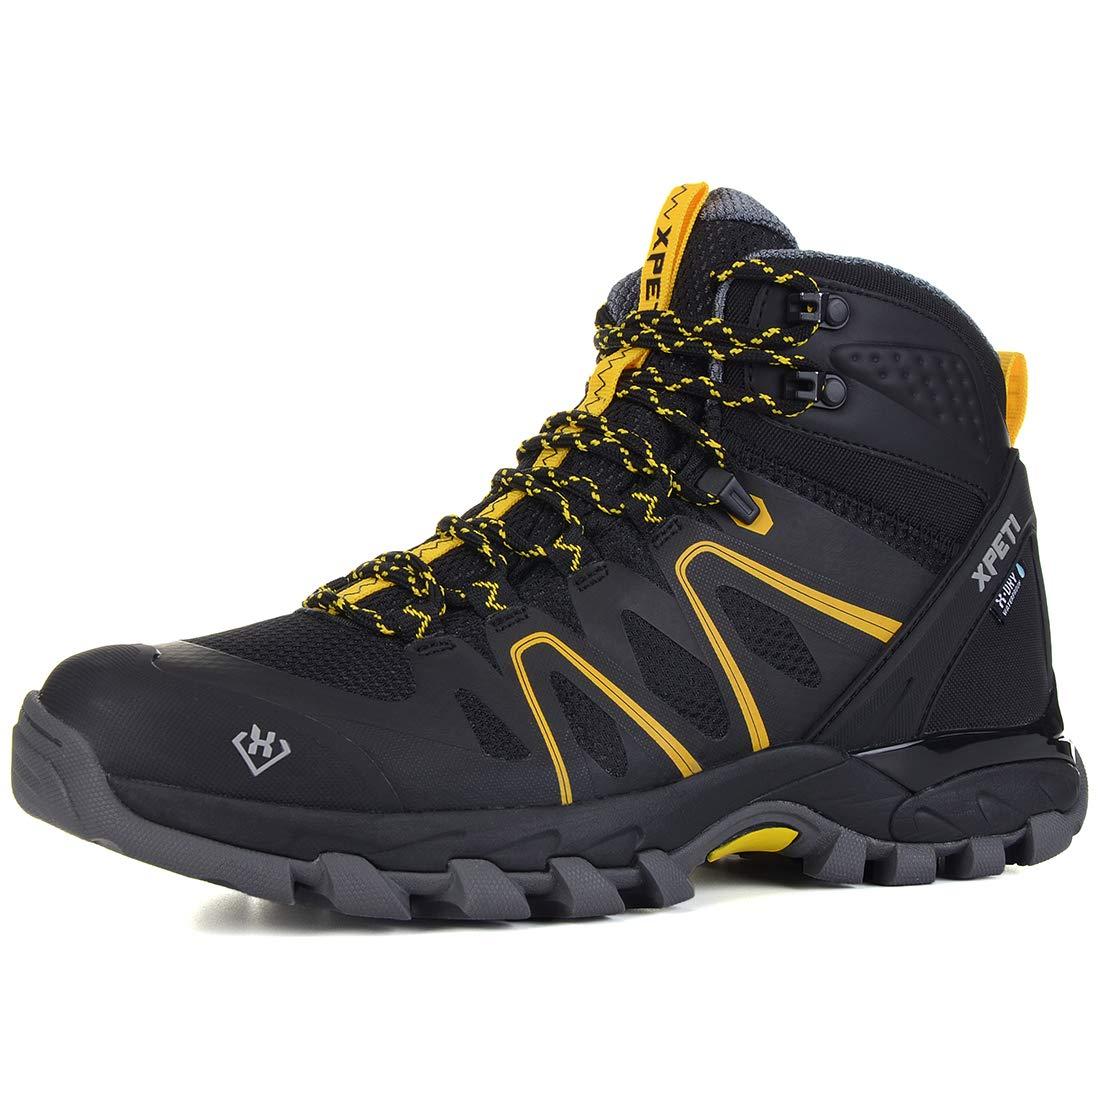 XPETI Men's Wildfire Mid Waterproof Hiking Boot Black/Yellow 13